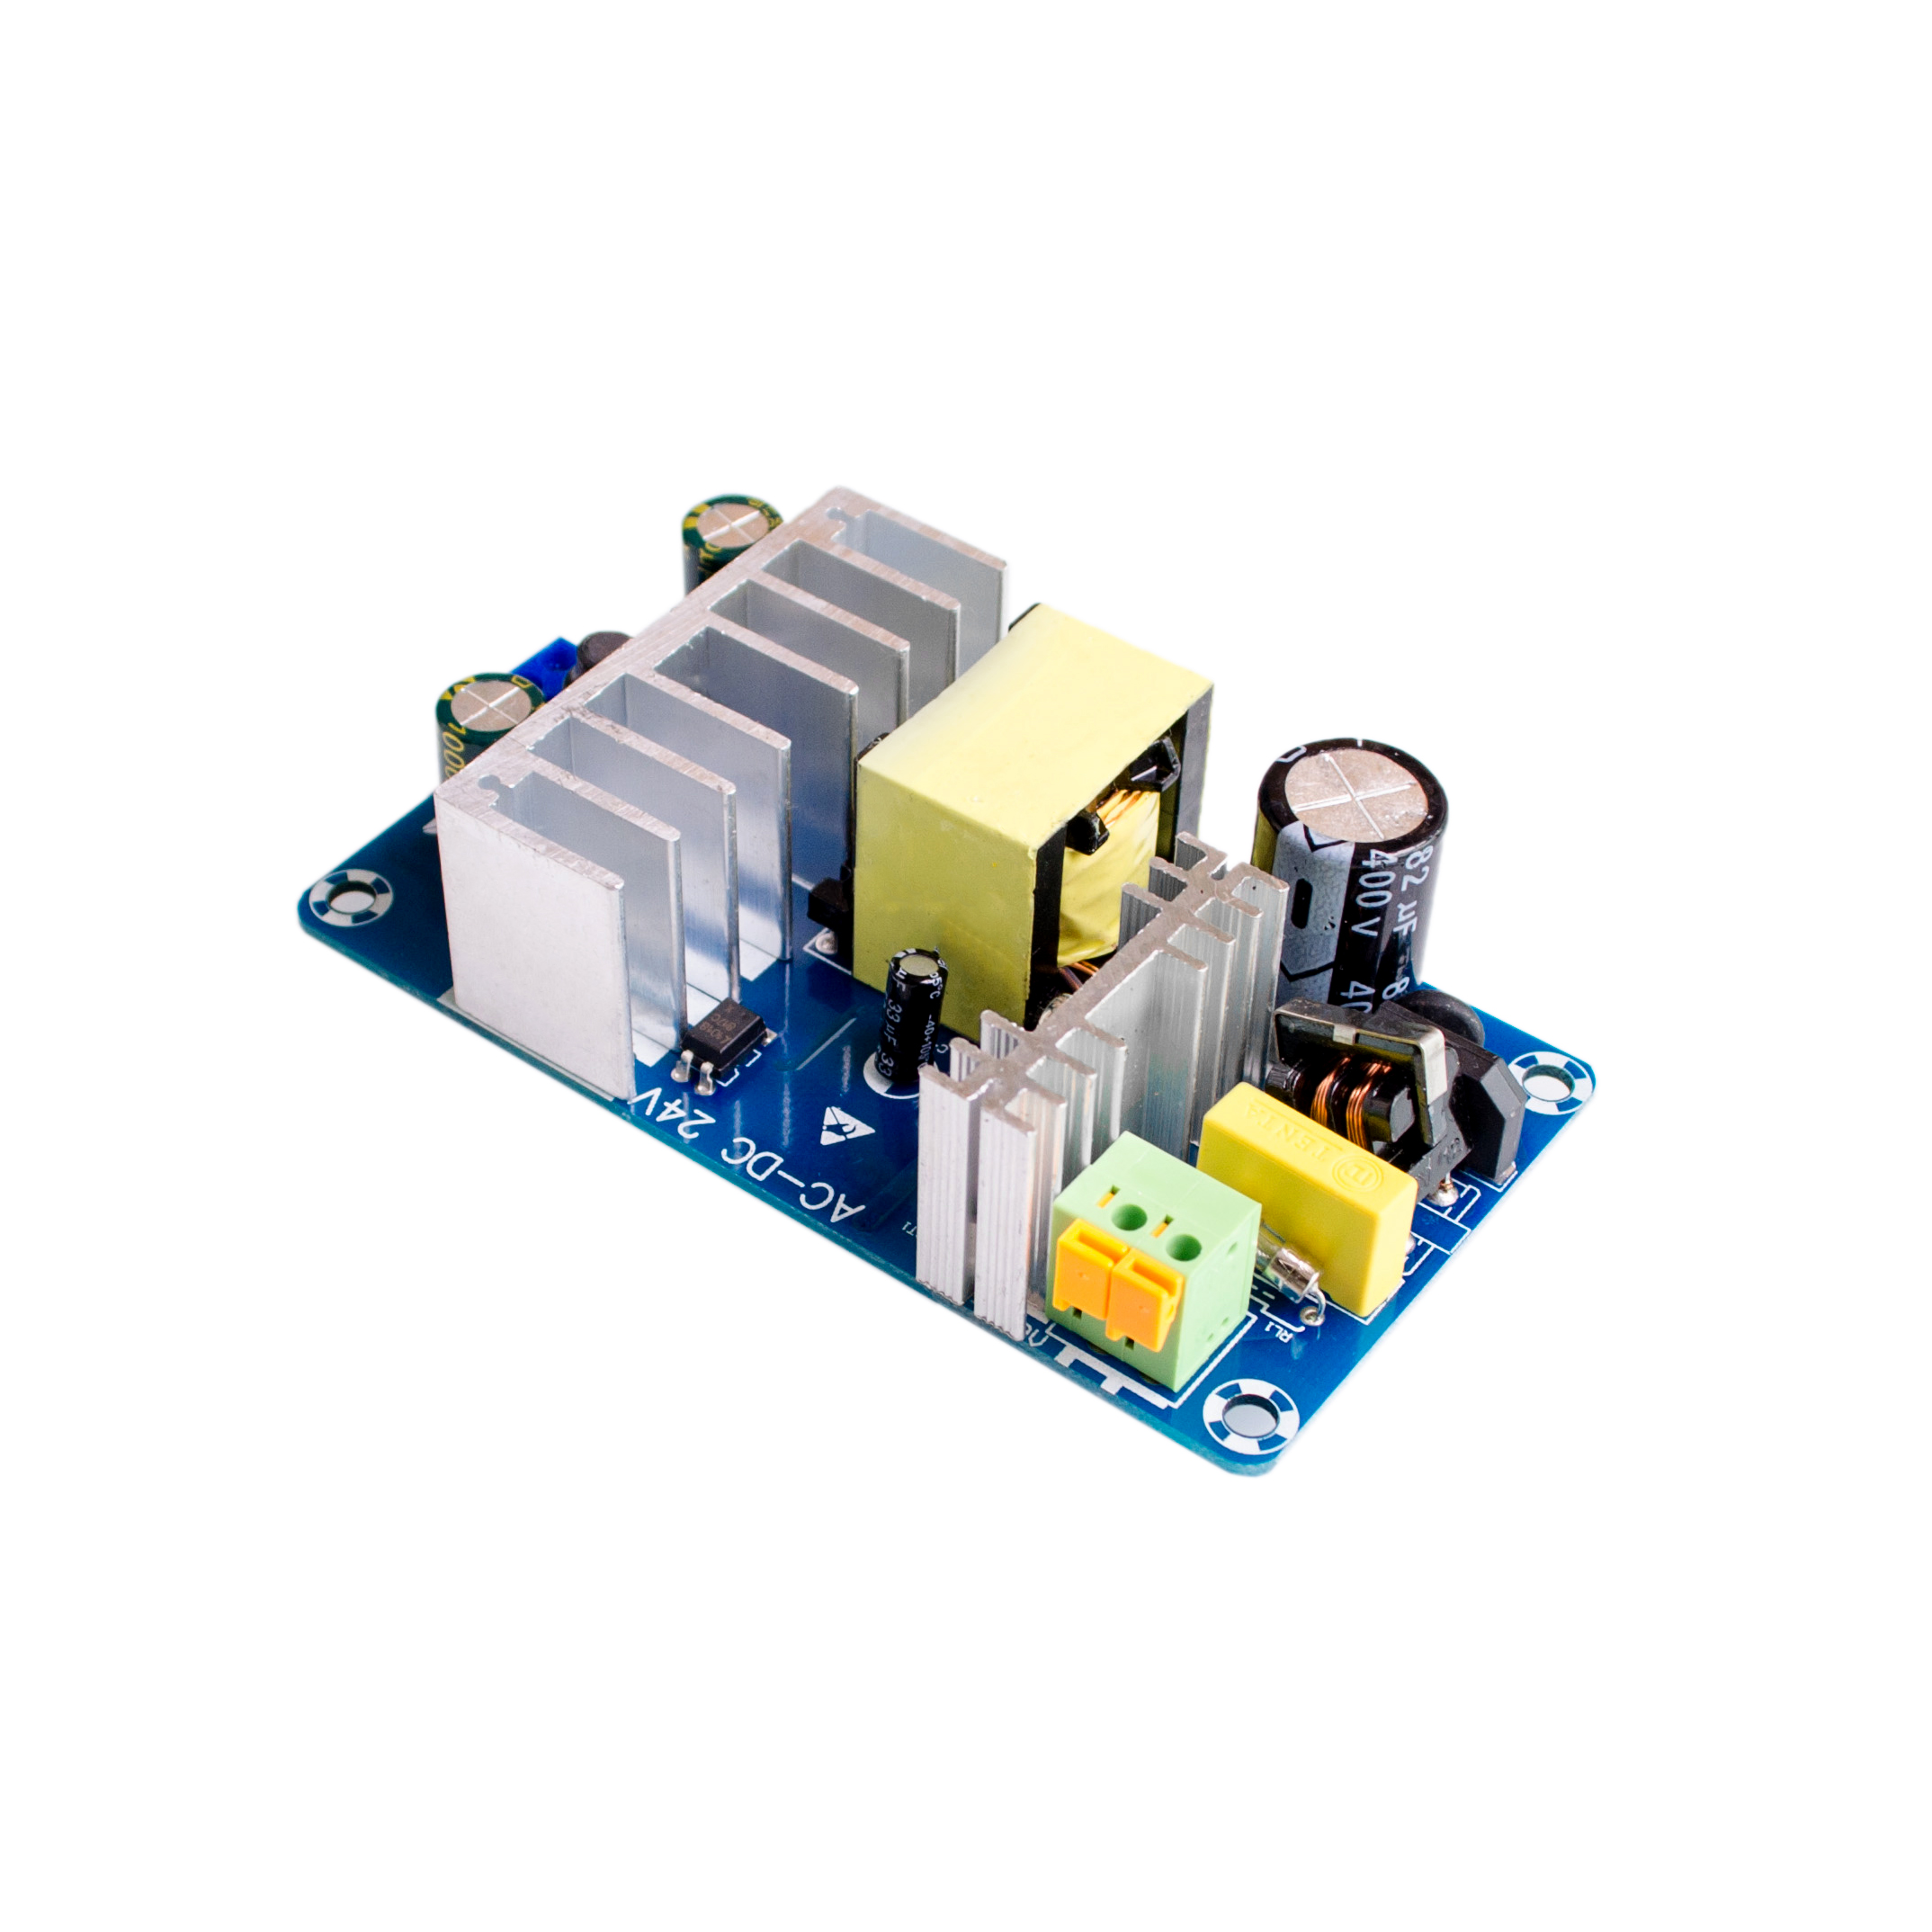 AC 100 240V to DC 24V 4A 6A switching power supply module AC DC|Промышленные компьютеры и аксессуары|   | АлиЭкспресс